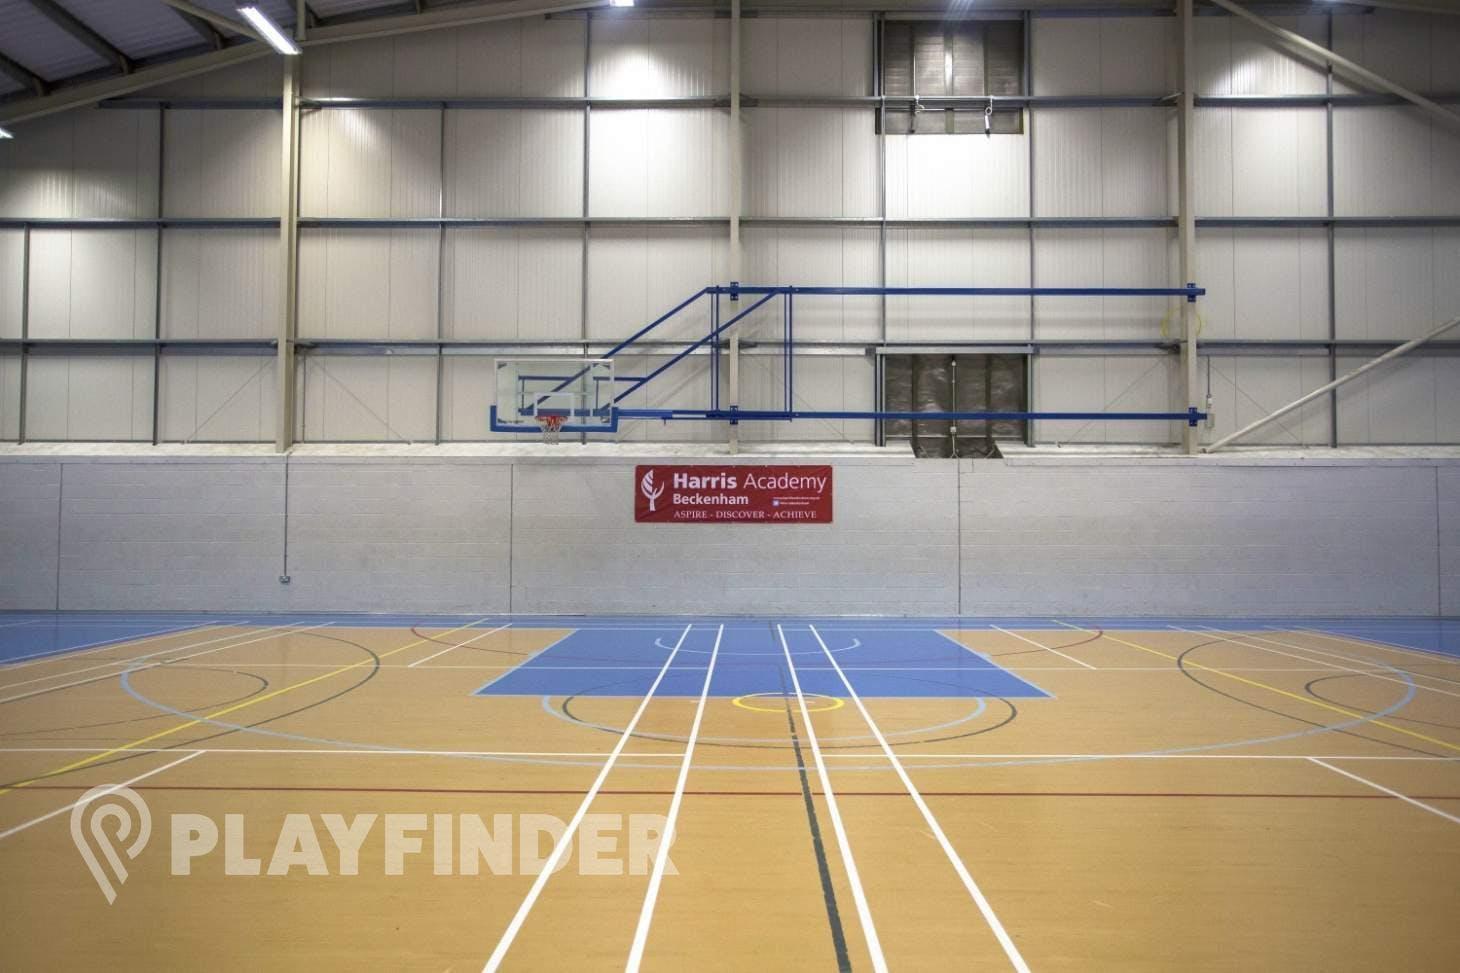 Harris Academy Beckenham Indoor netball court